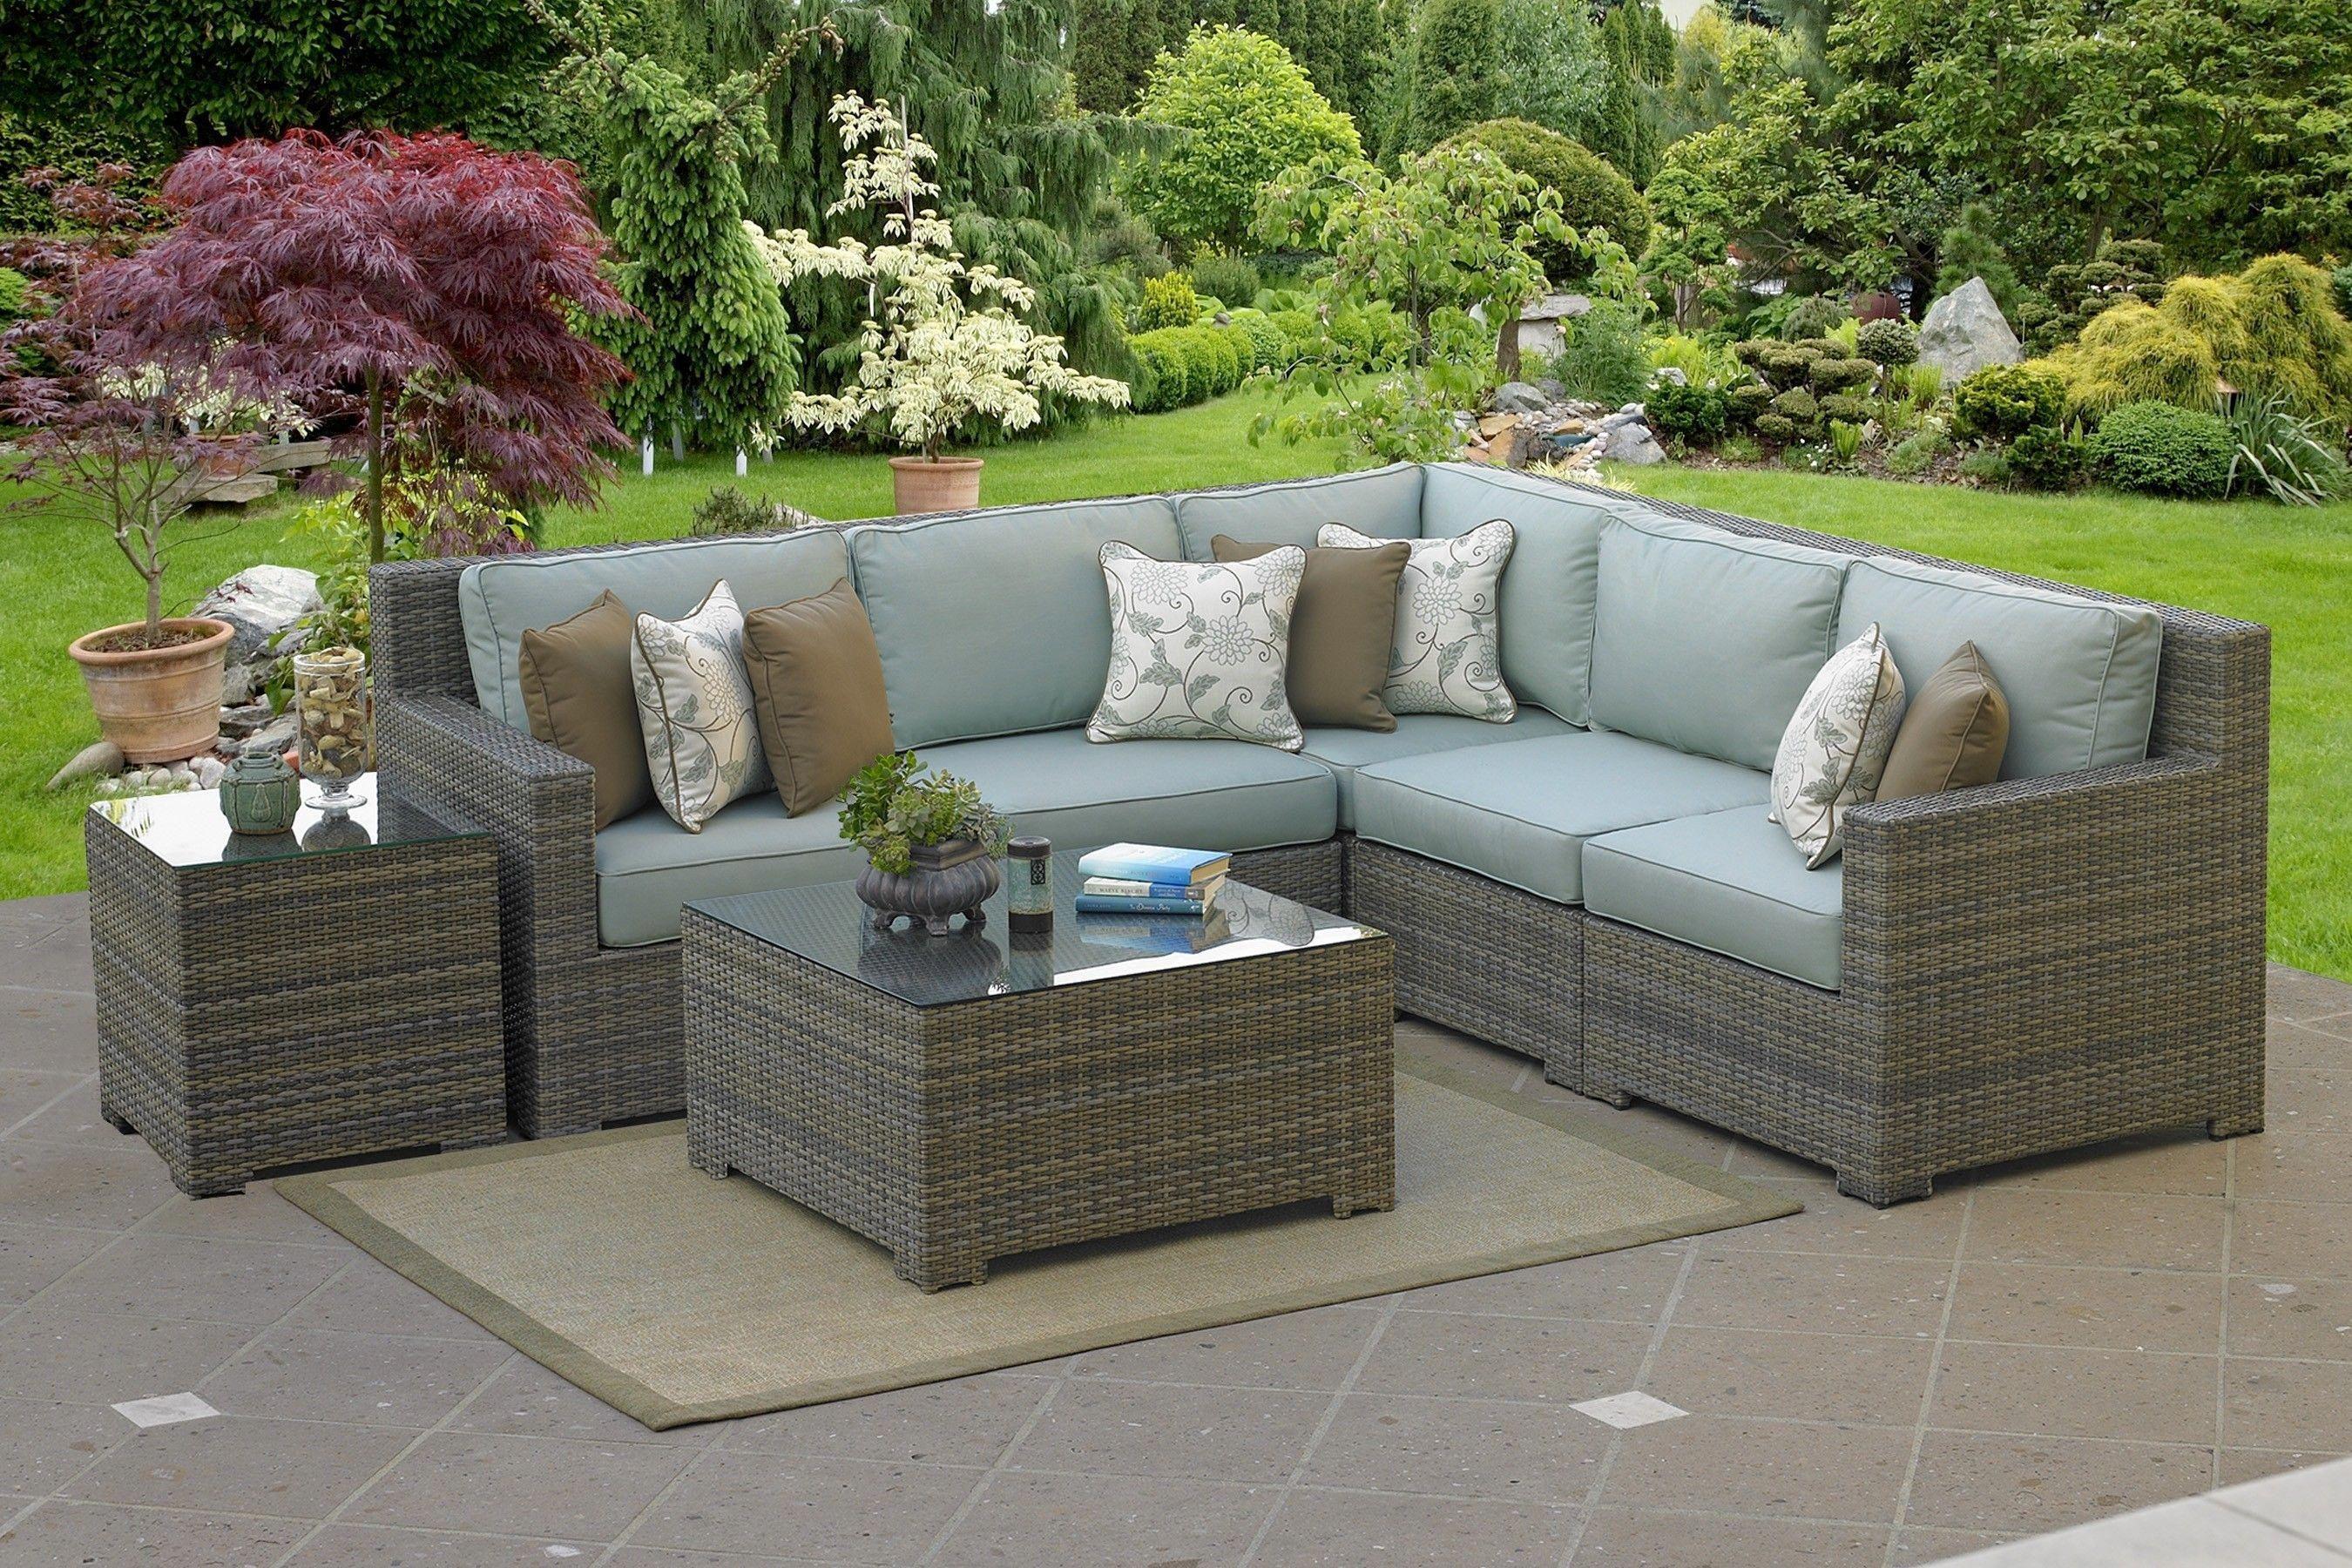 Cheapest Furniture Rental Fastfurniturerepairllc Outdoor Furniture Nz Patio Sofa Set Used Outdoor Furniture